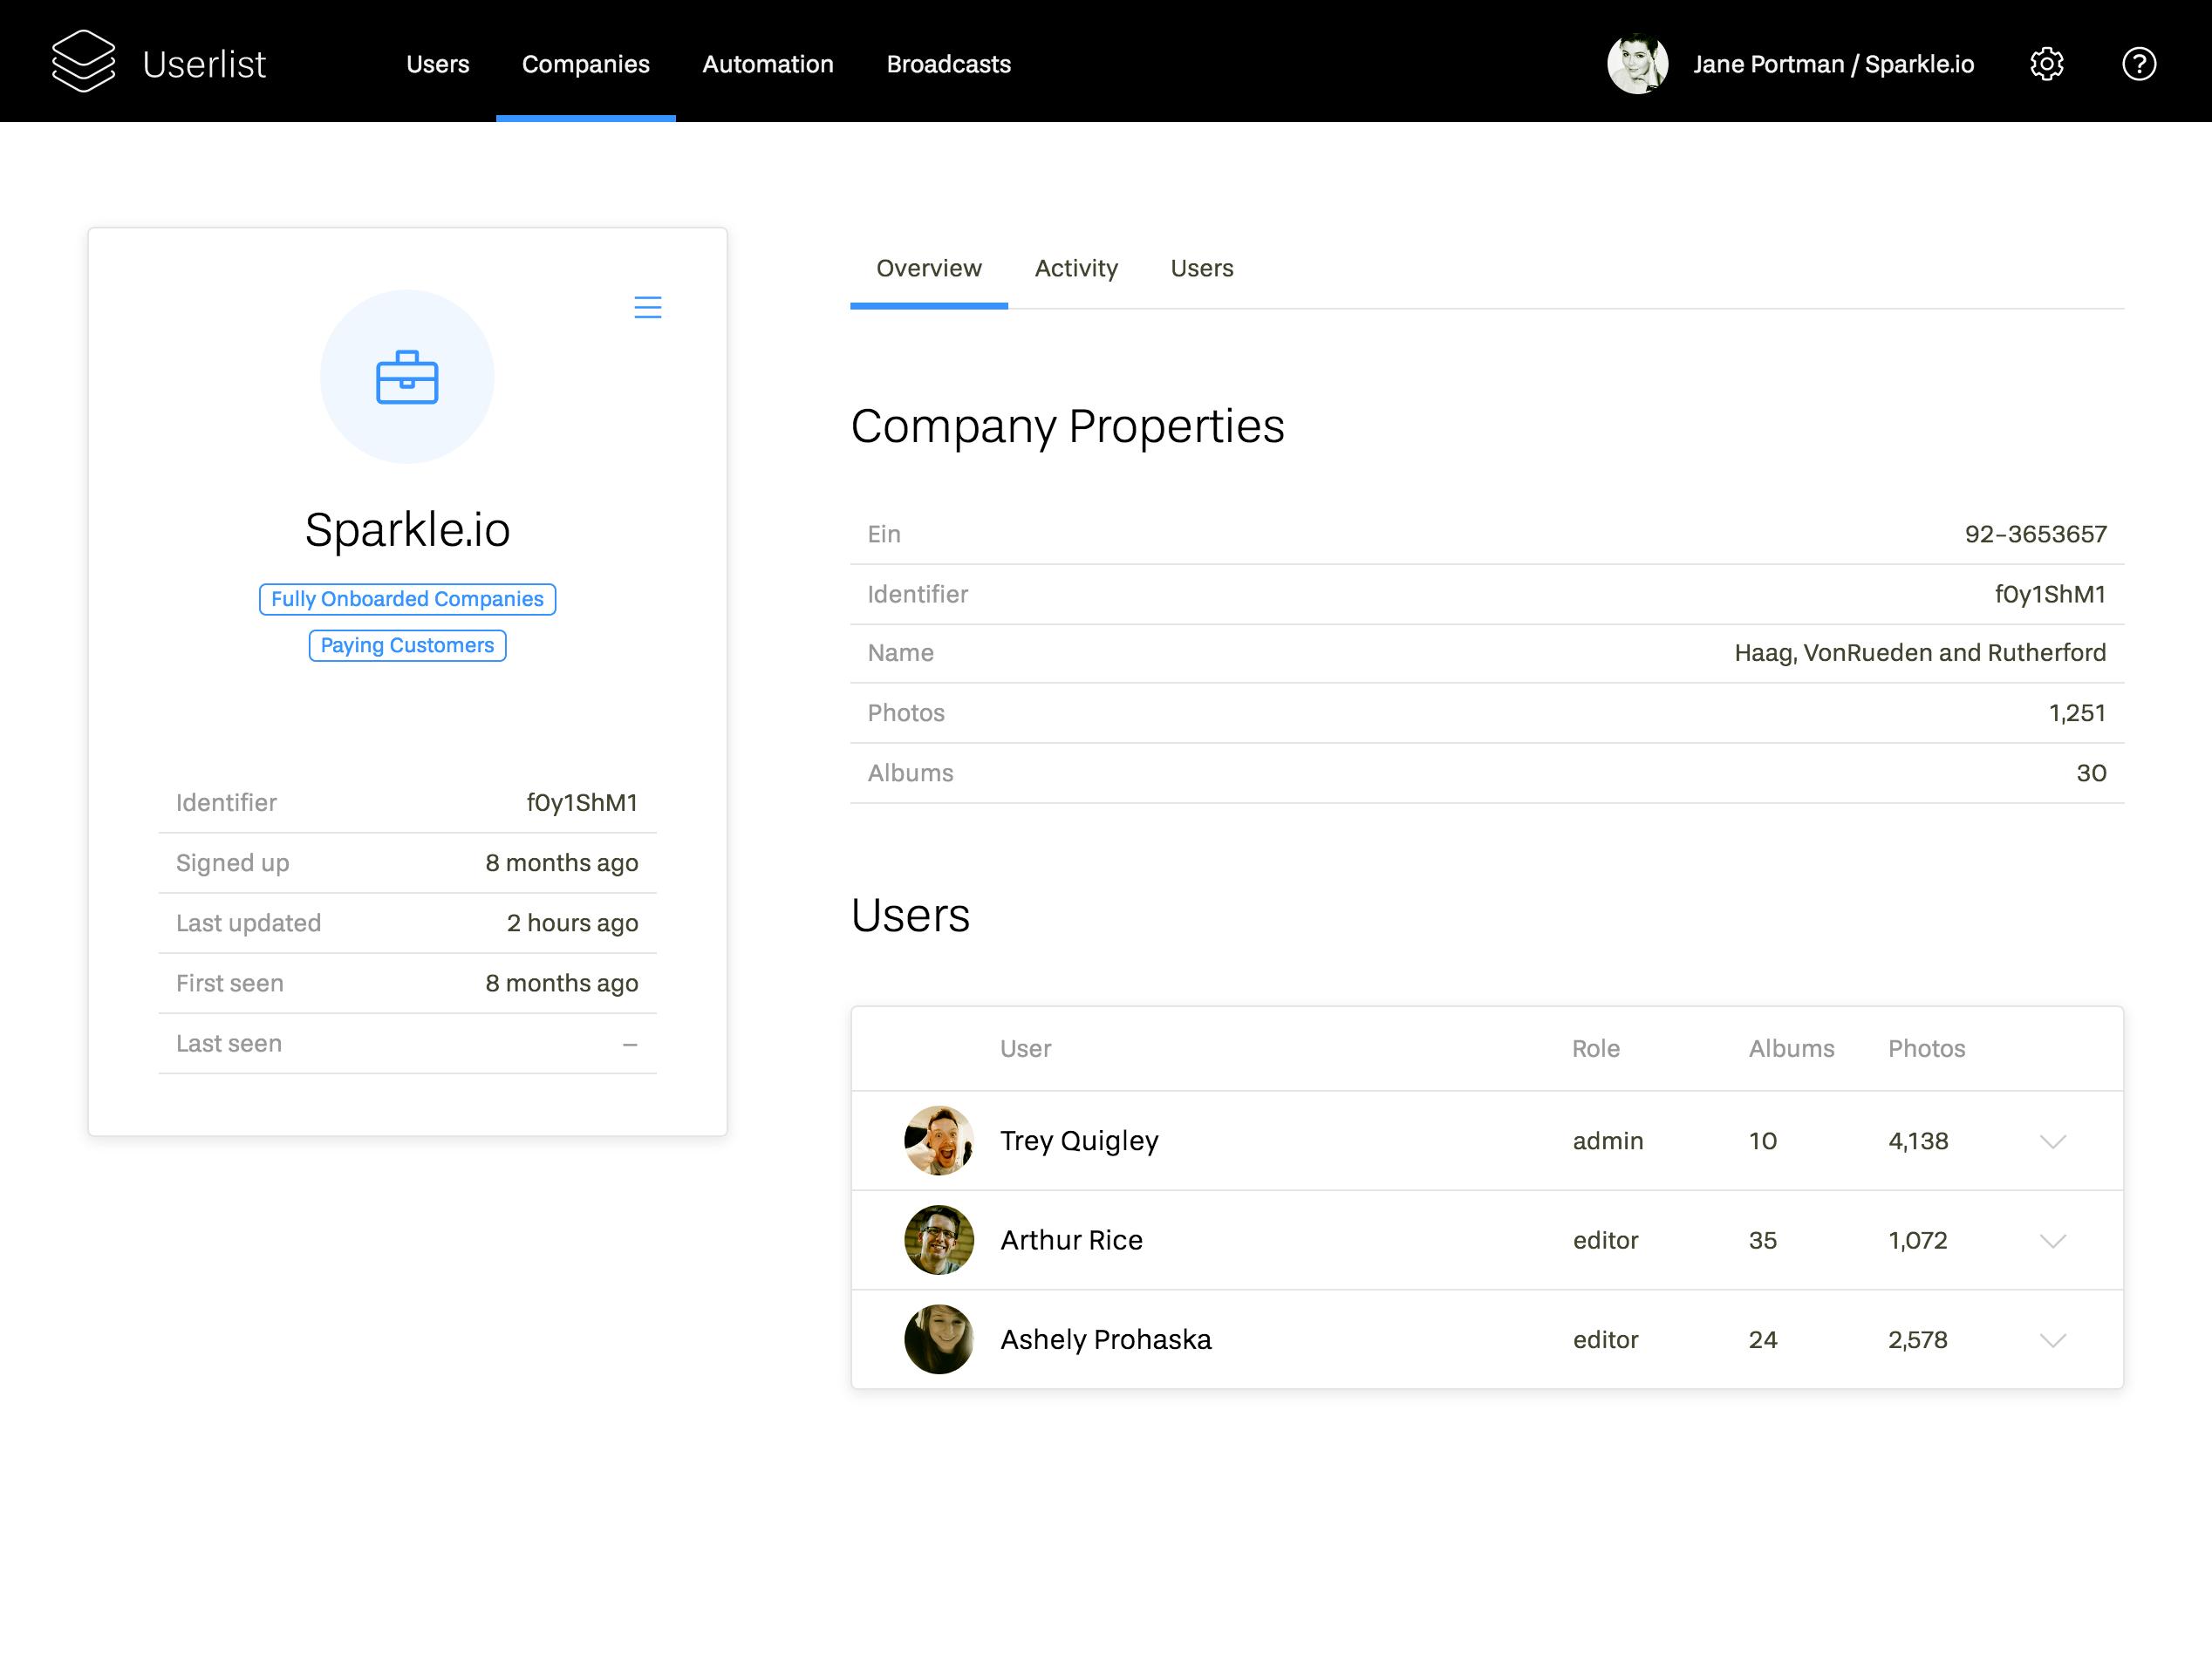 Serve companies, notindividual users